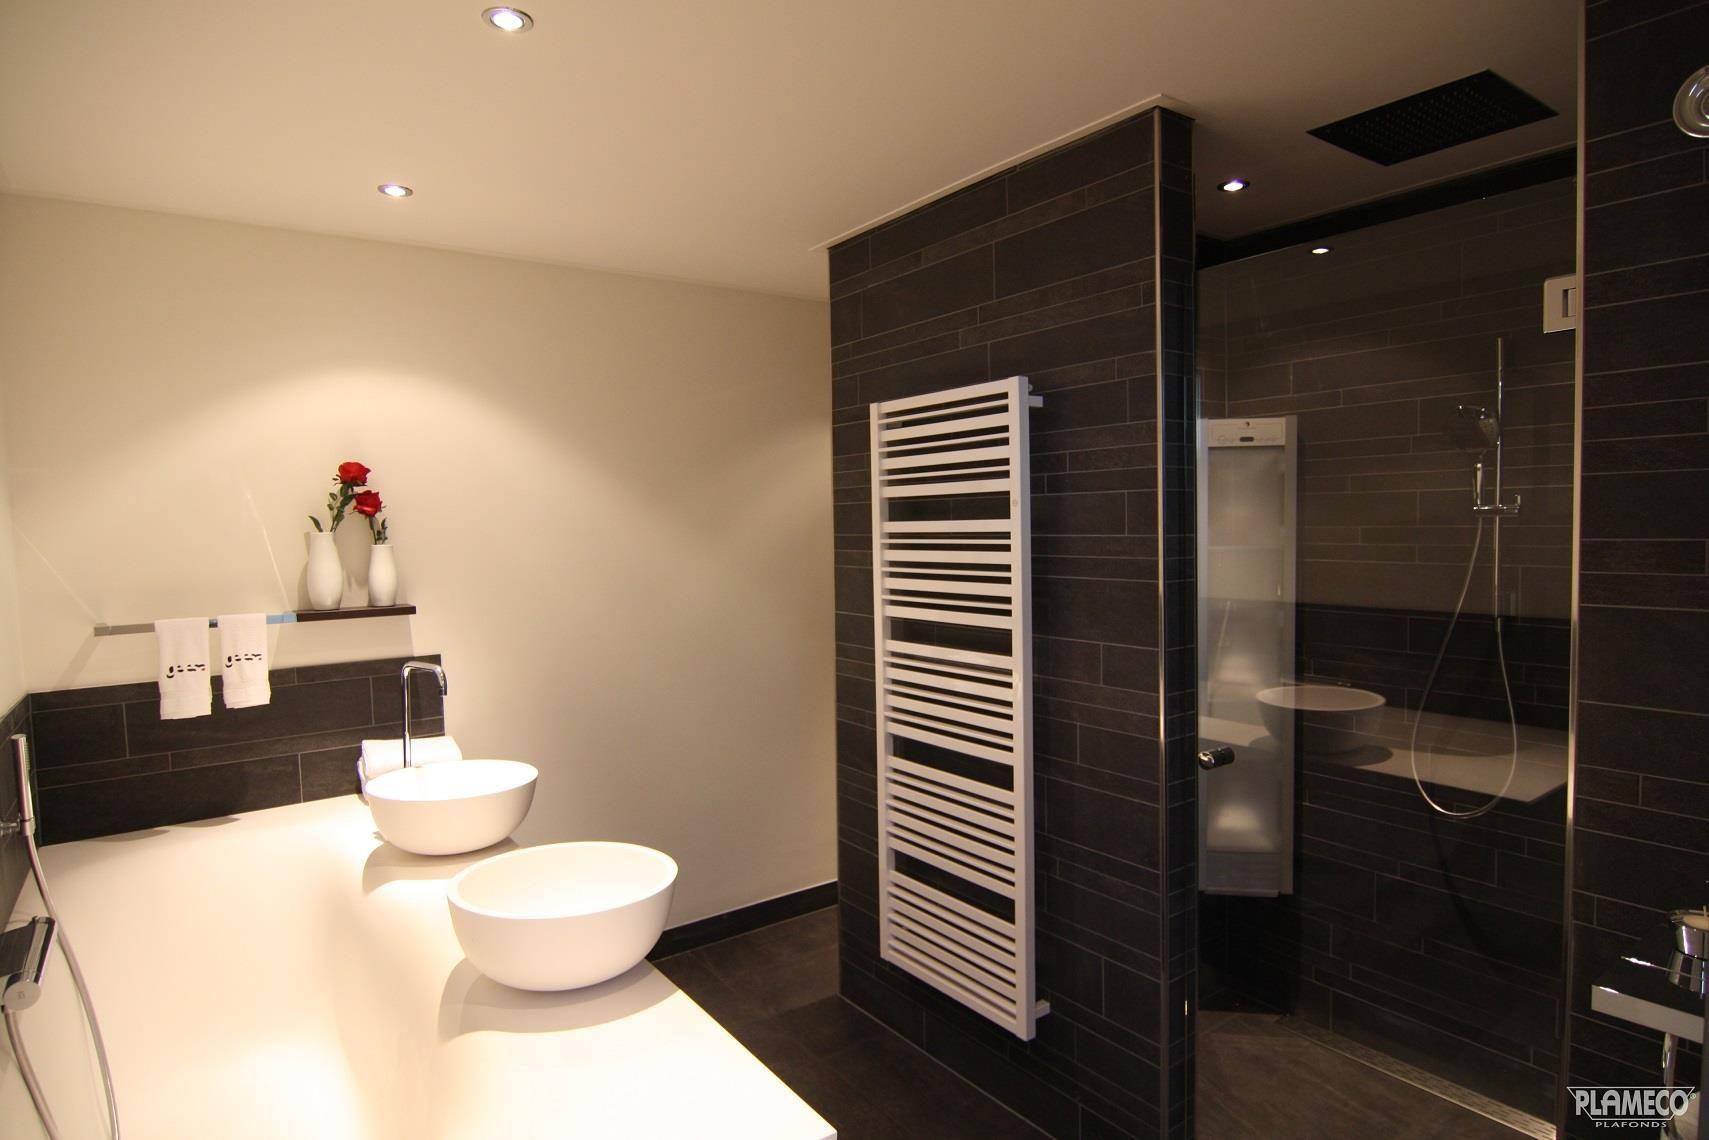 Kunststof Plafond Badkamer : Strak kunststof plafond badkamer google zoeken badkamer